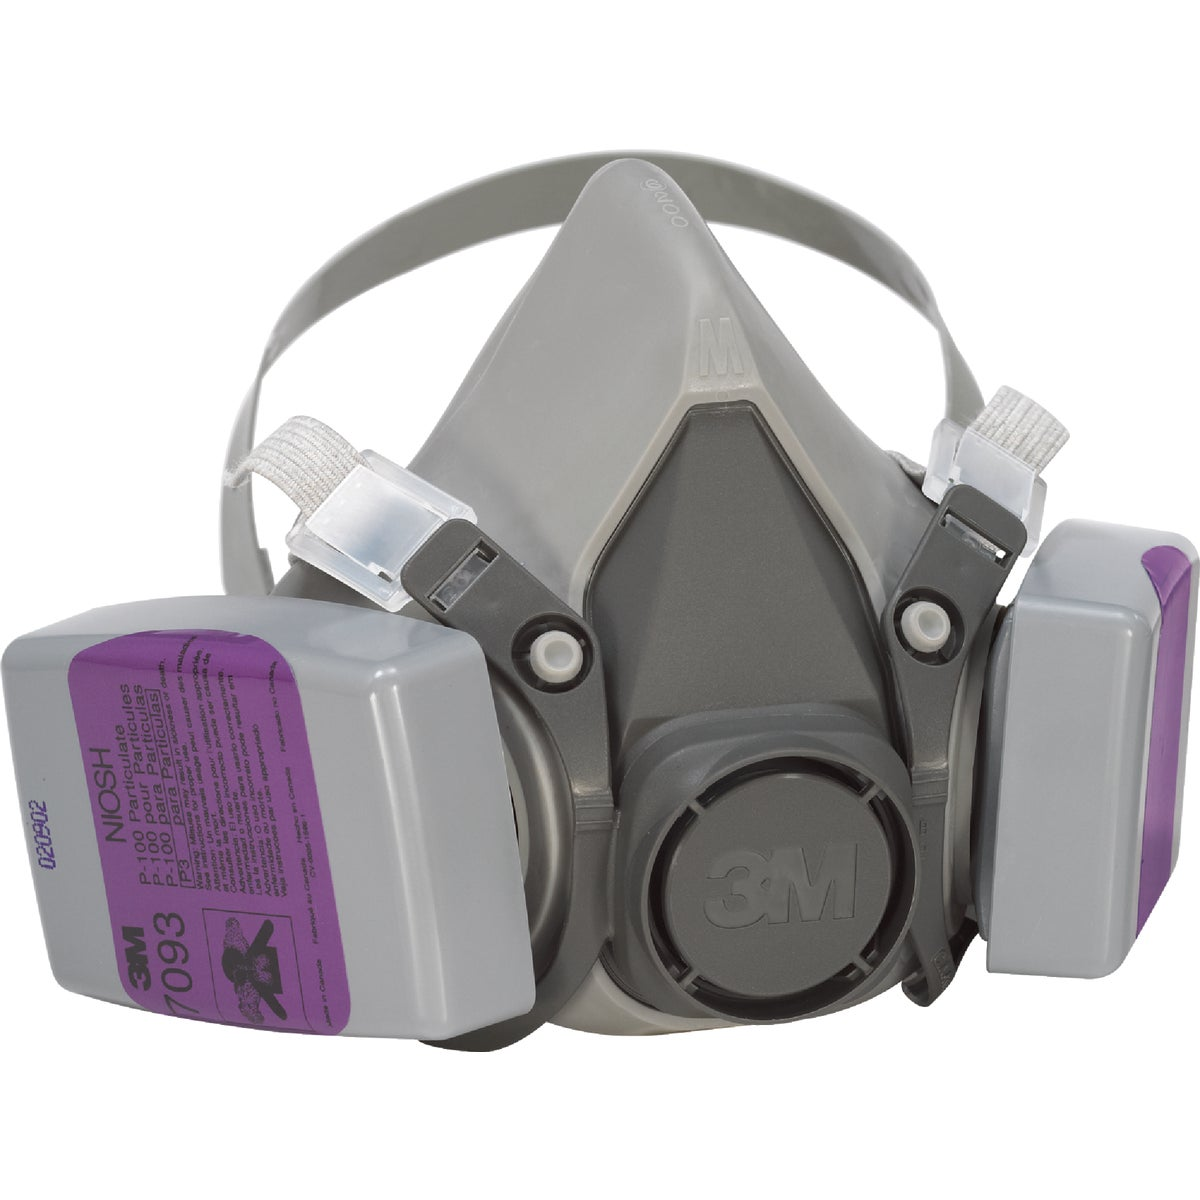 3M P100 Demolition and Renovation Respirator